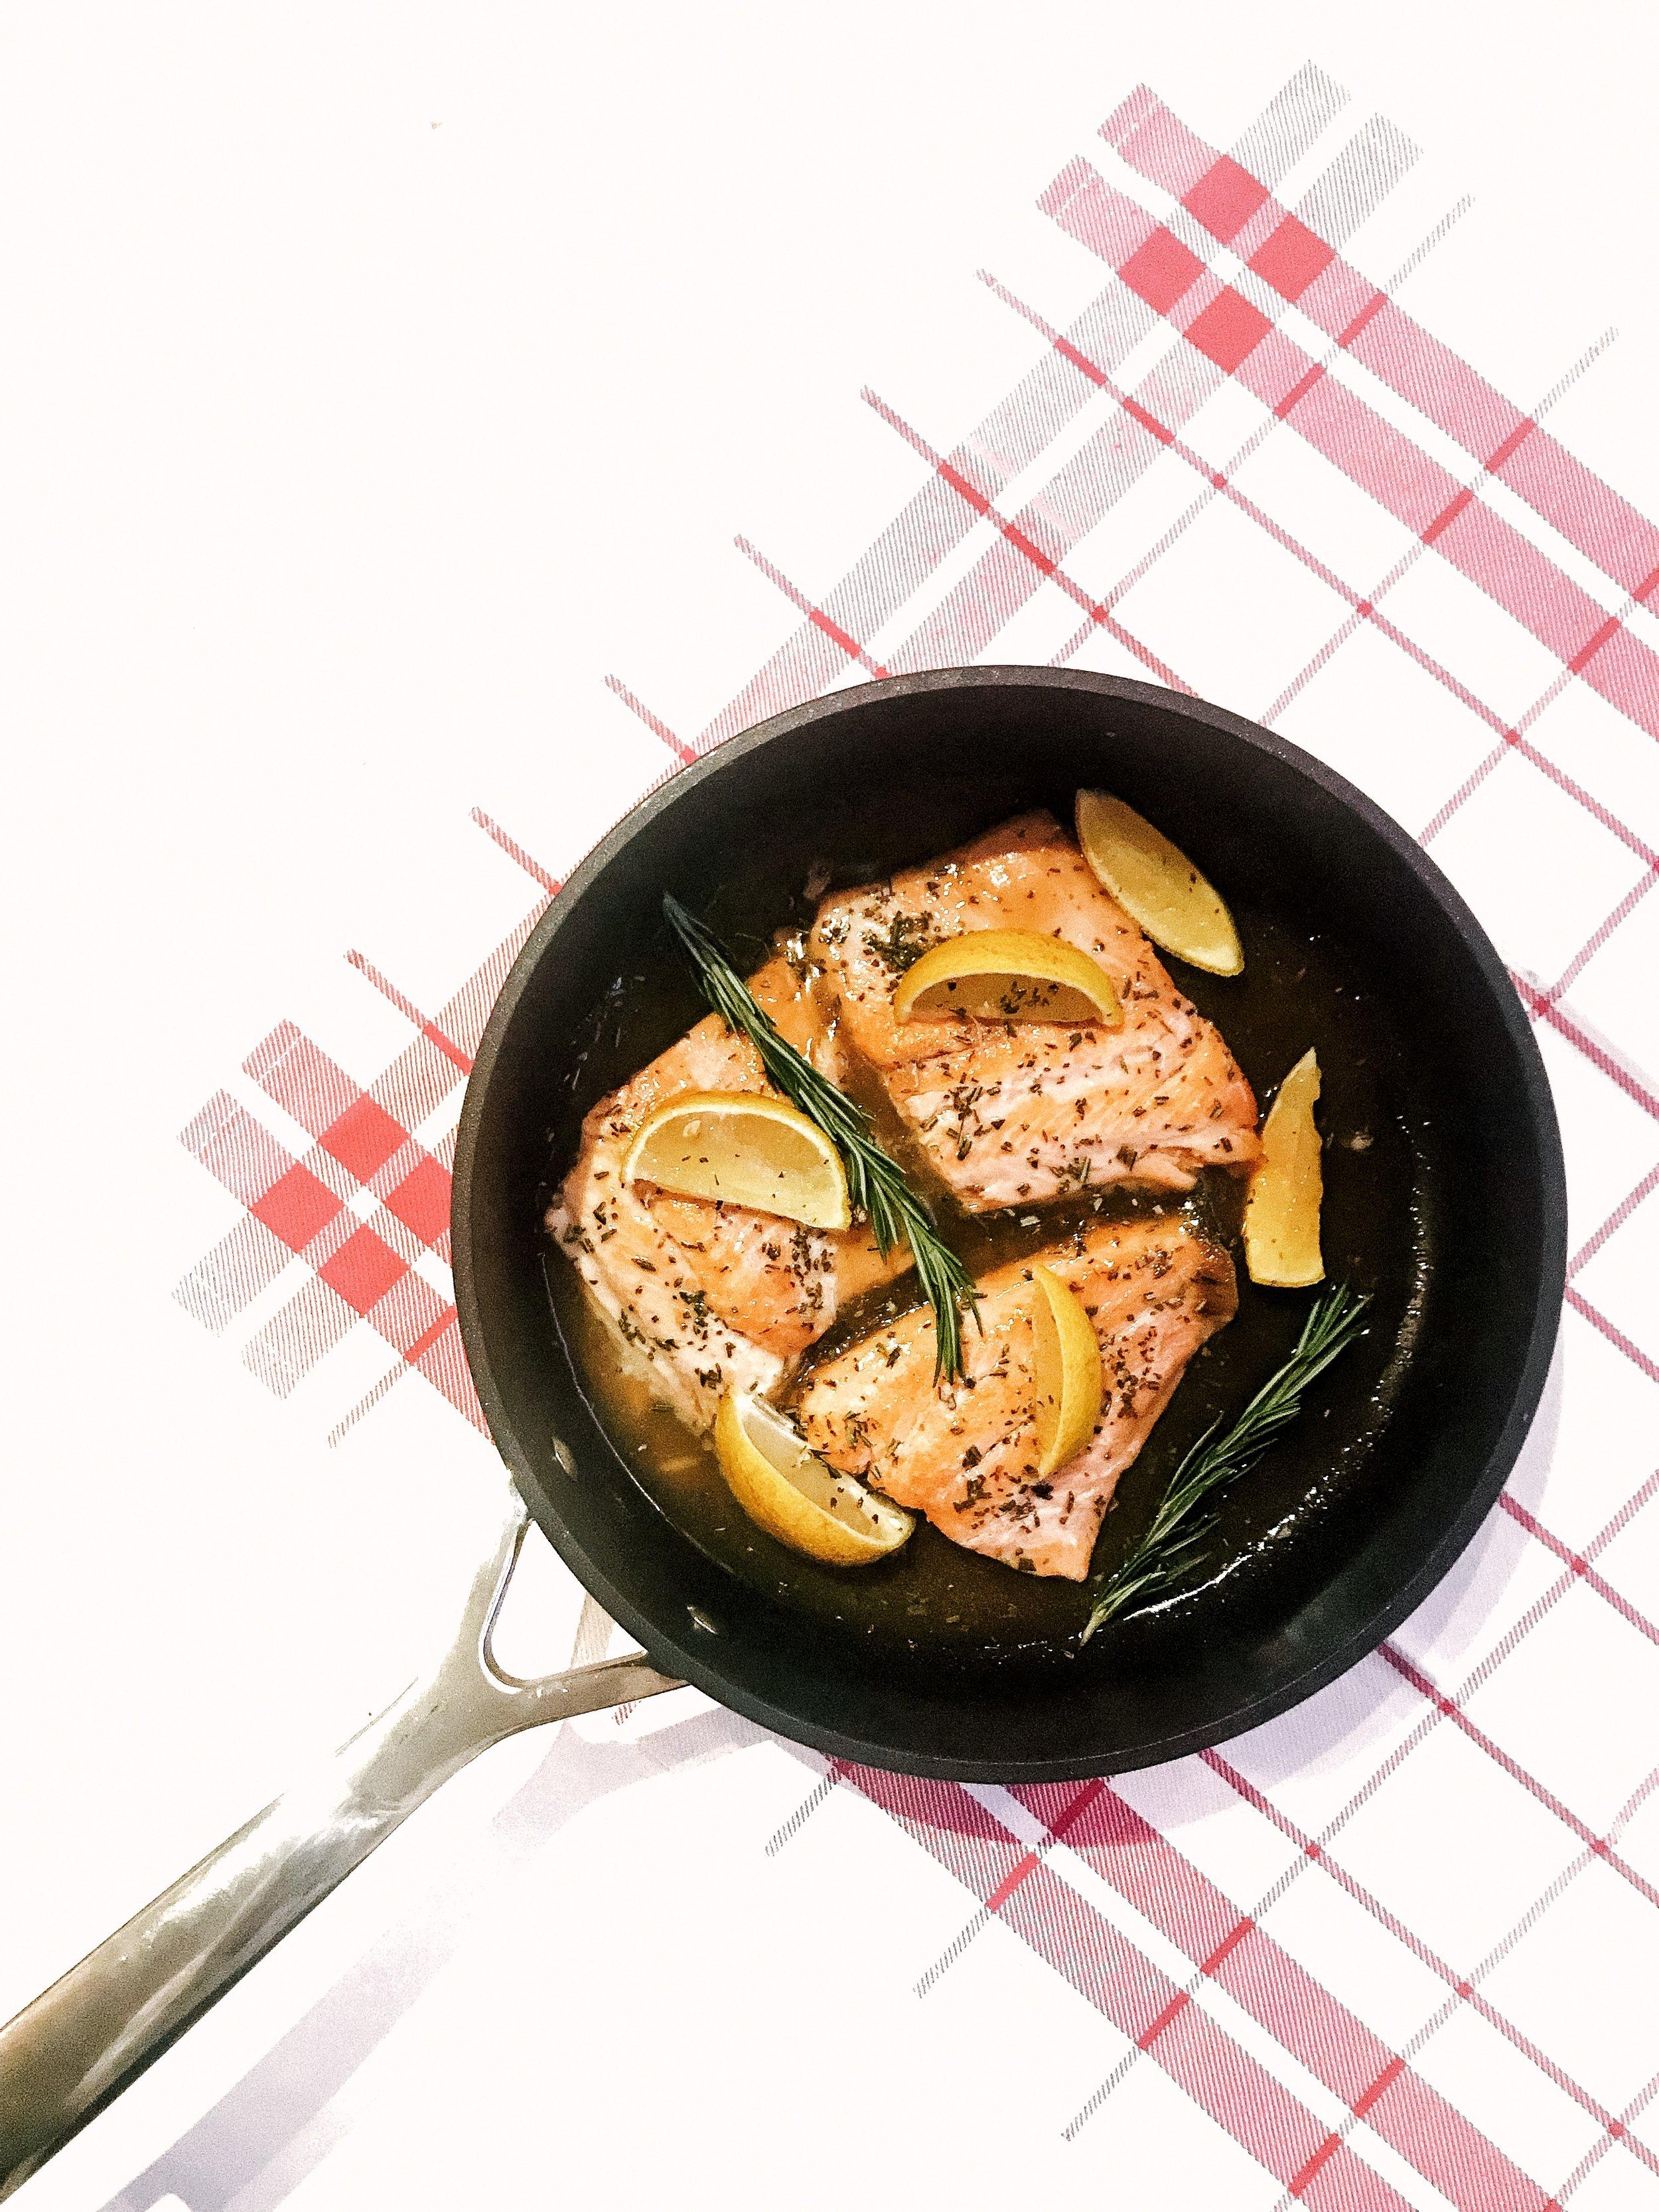 Lemon Rosemary Salmon - Healthy Dinner - AIP, GAPS, Paleo, Gluten-Free, Dairy-Free